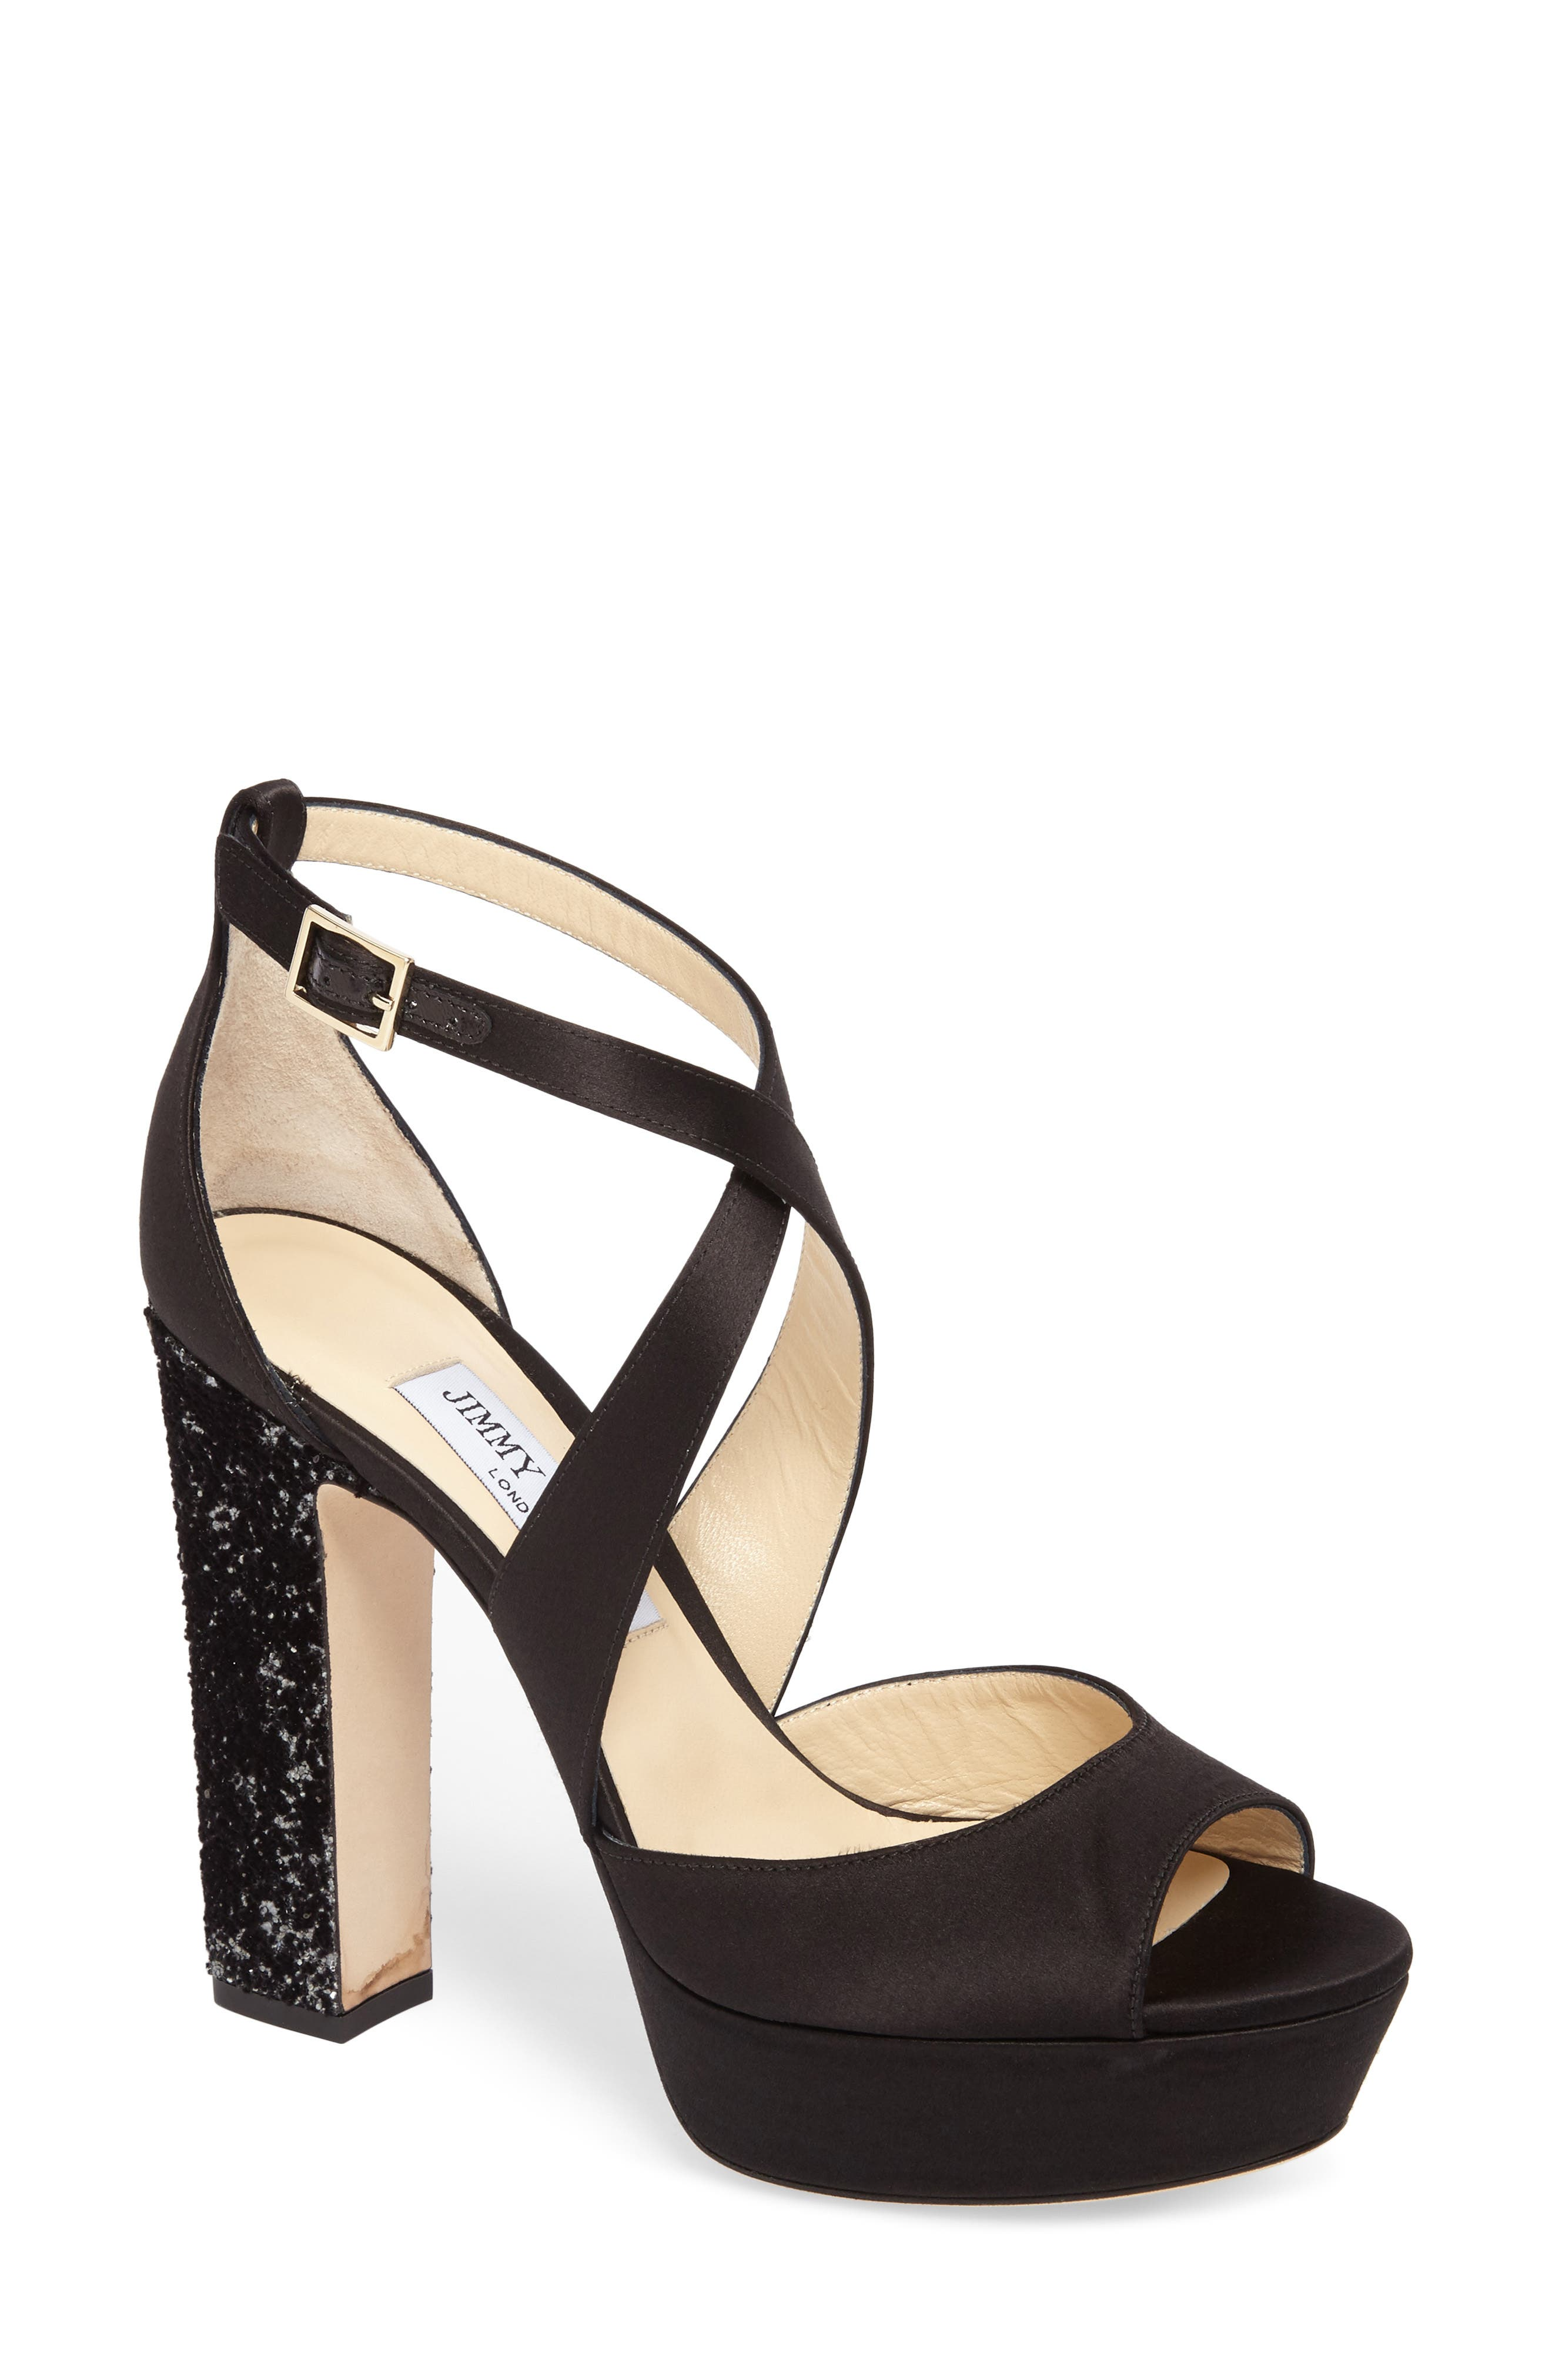 April Platform Sandal,                             Main thumbnail 1, color,                             Black/ Anthracite/ Black